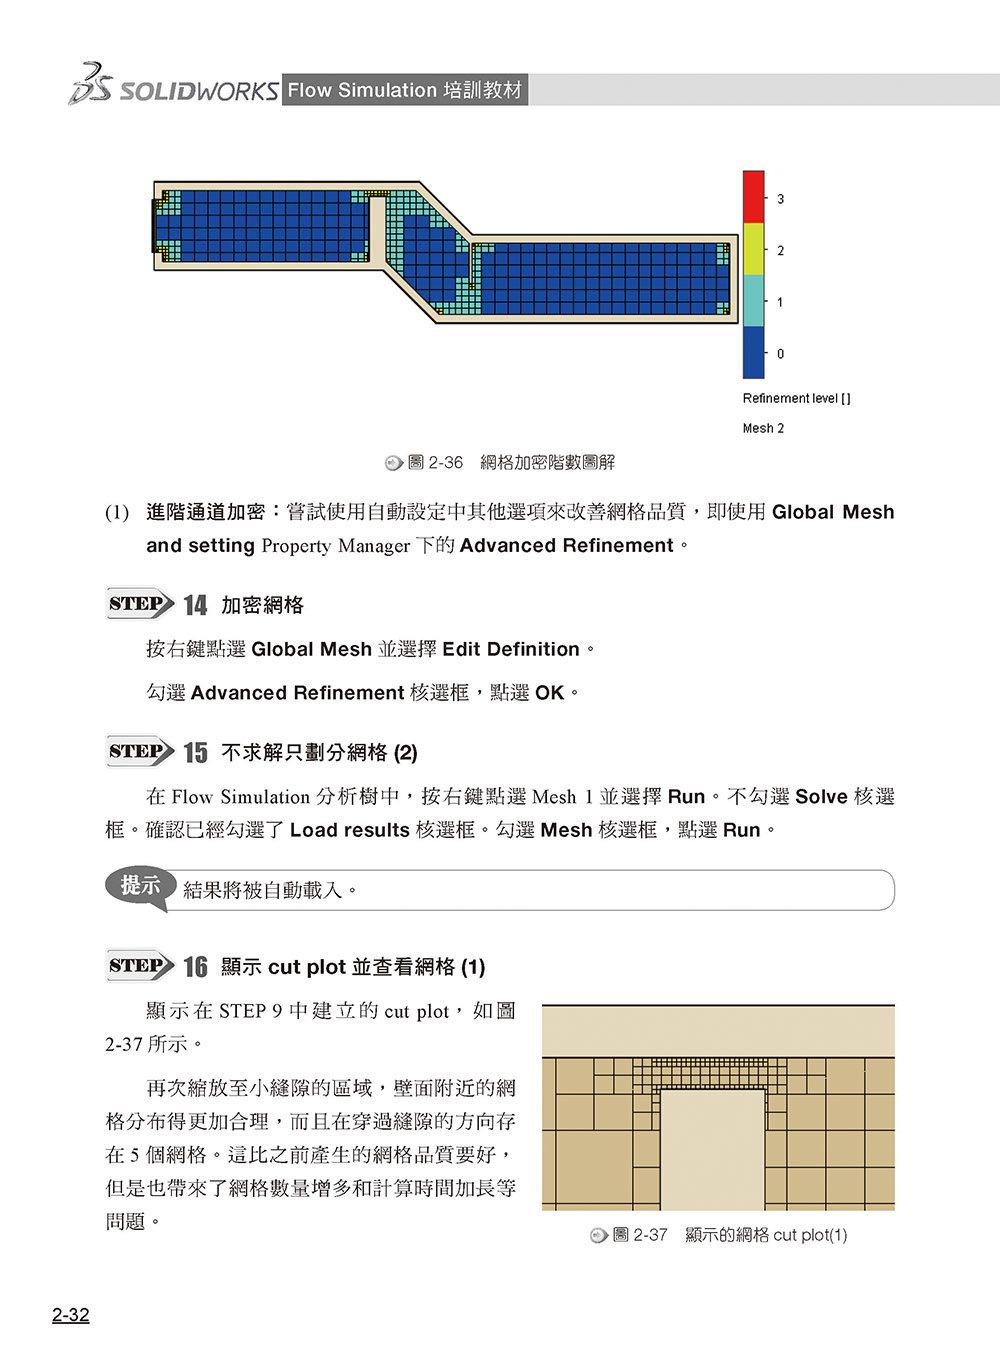 SOLIDWORKS Flow Simulation 培訓教材<繁體中文版>-preview-14